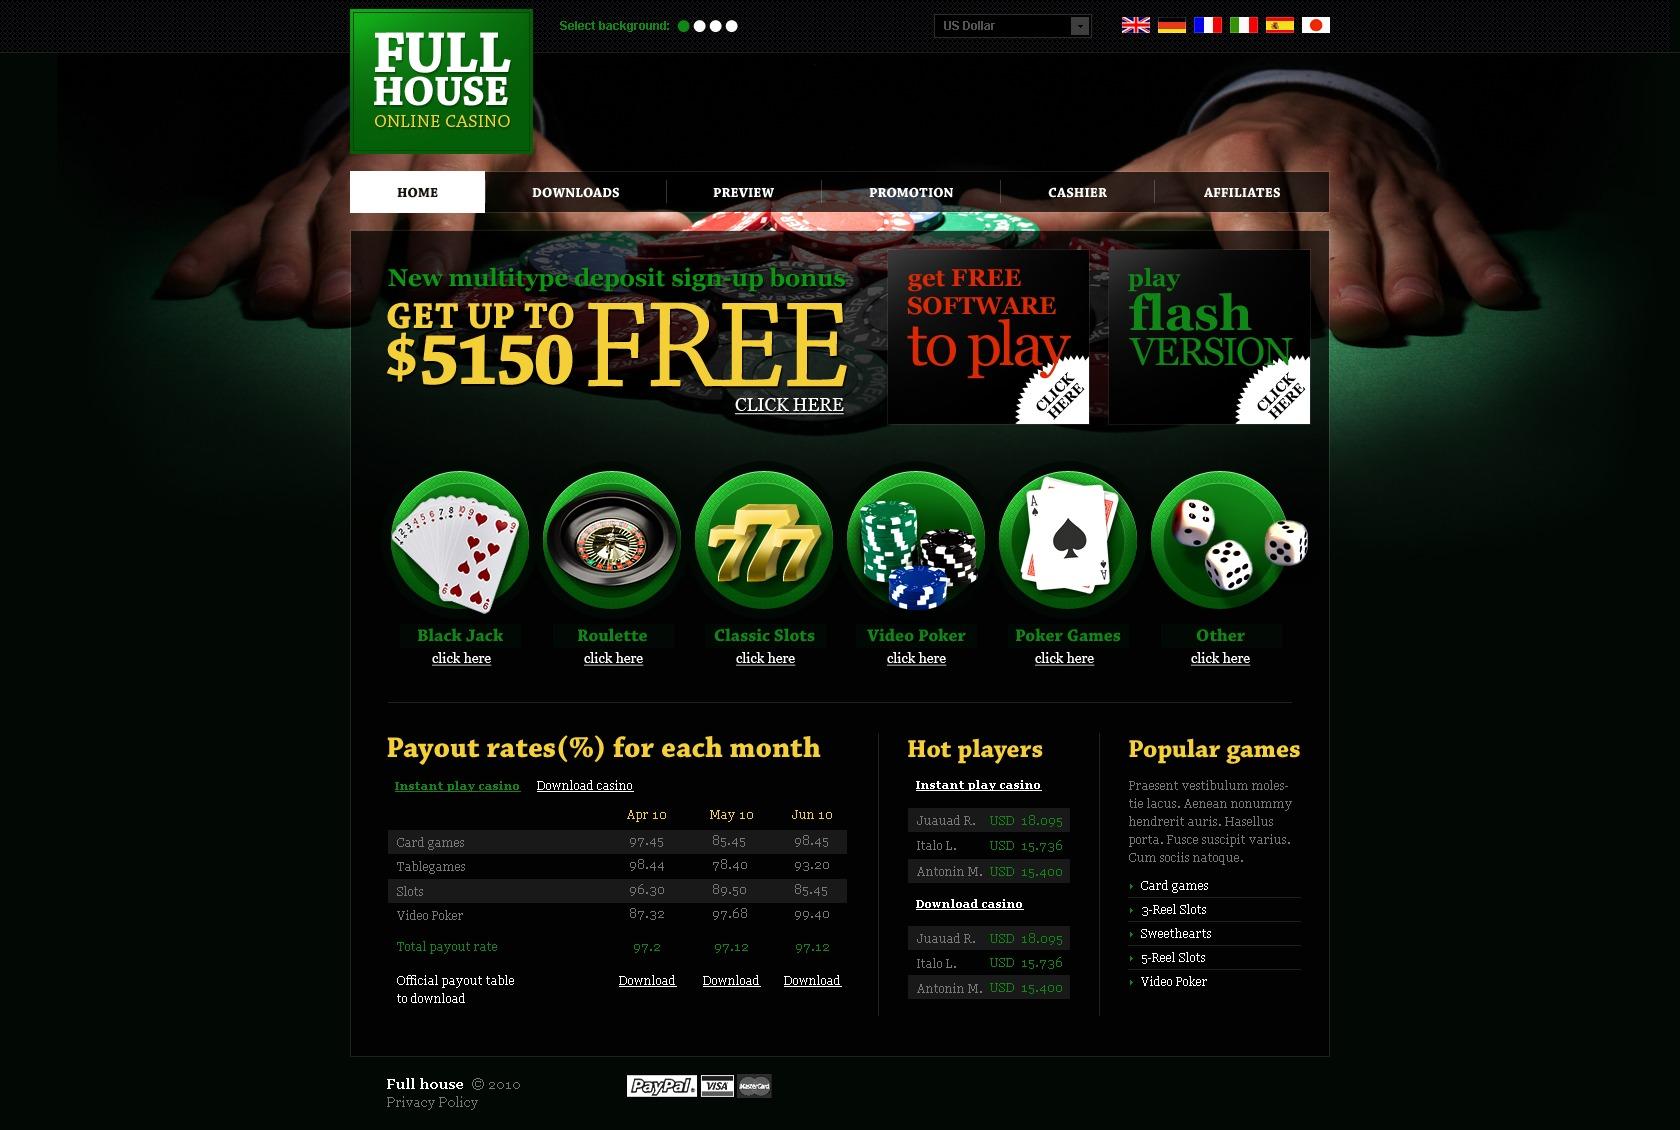 On line casino sites free online casino penny slots